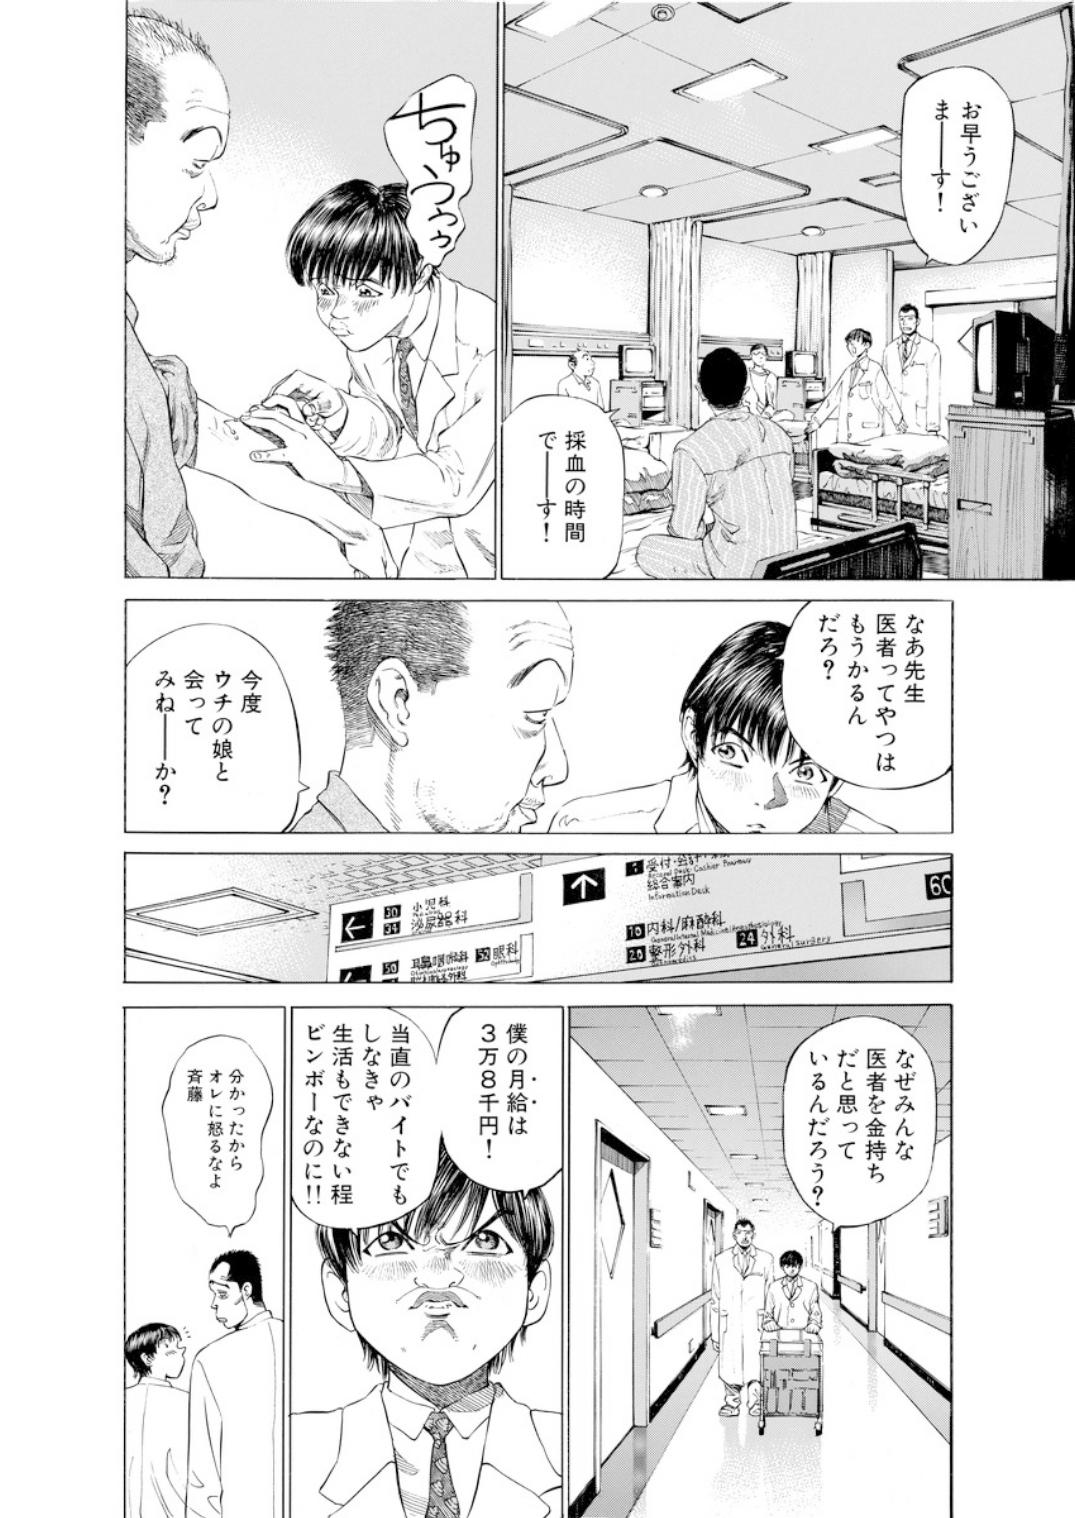 001bj_page-0066.jpg